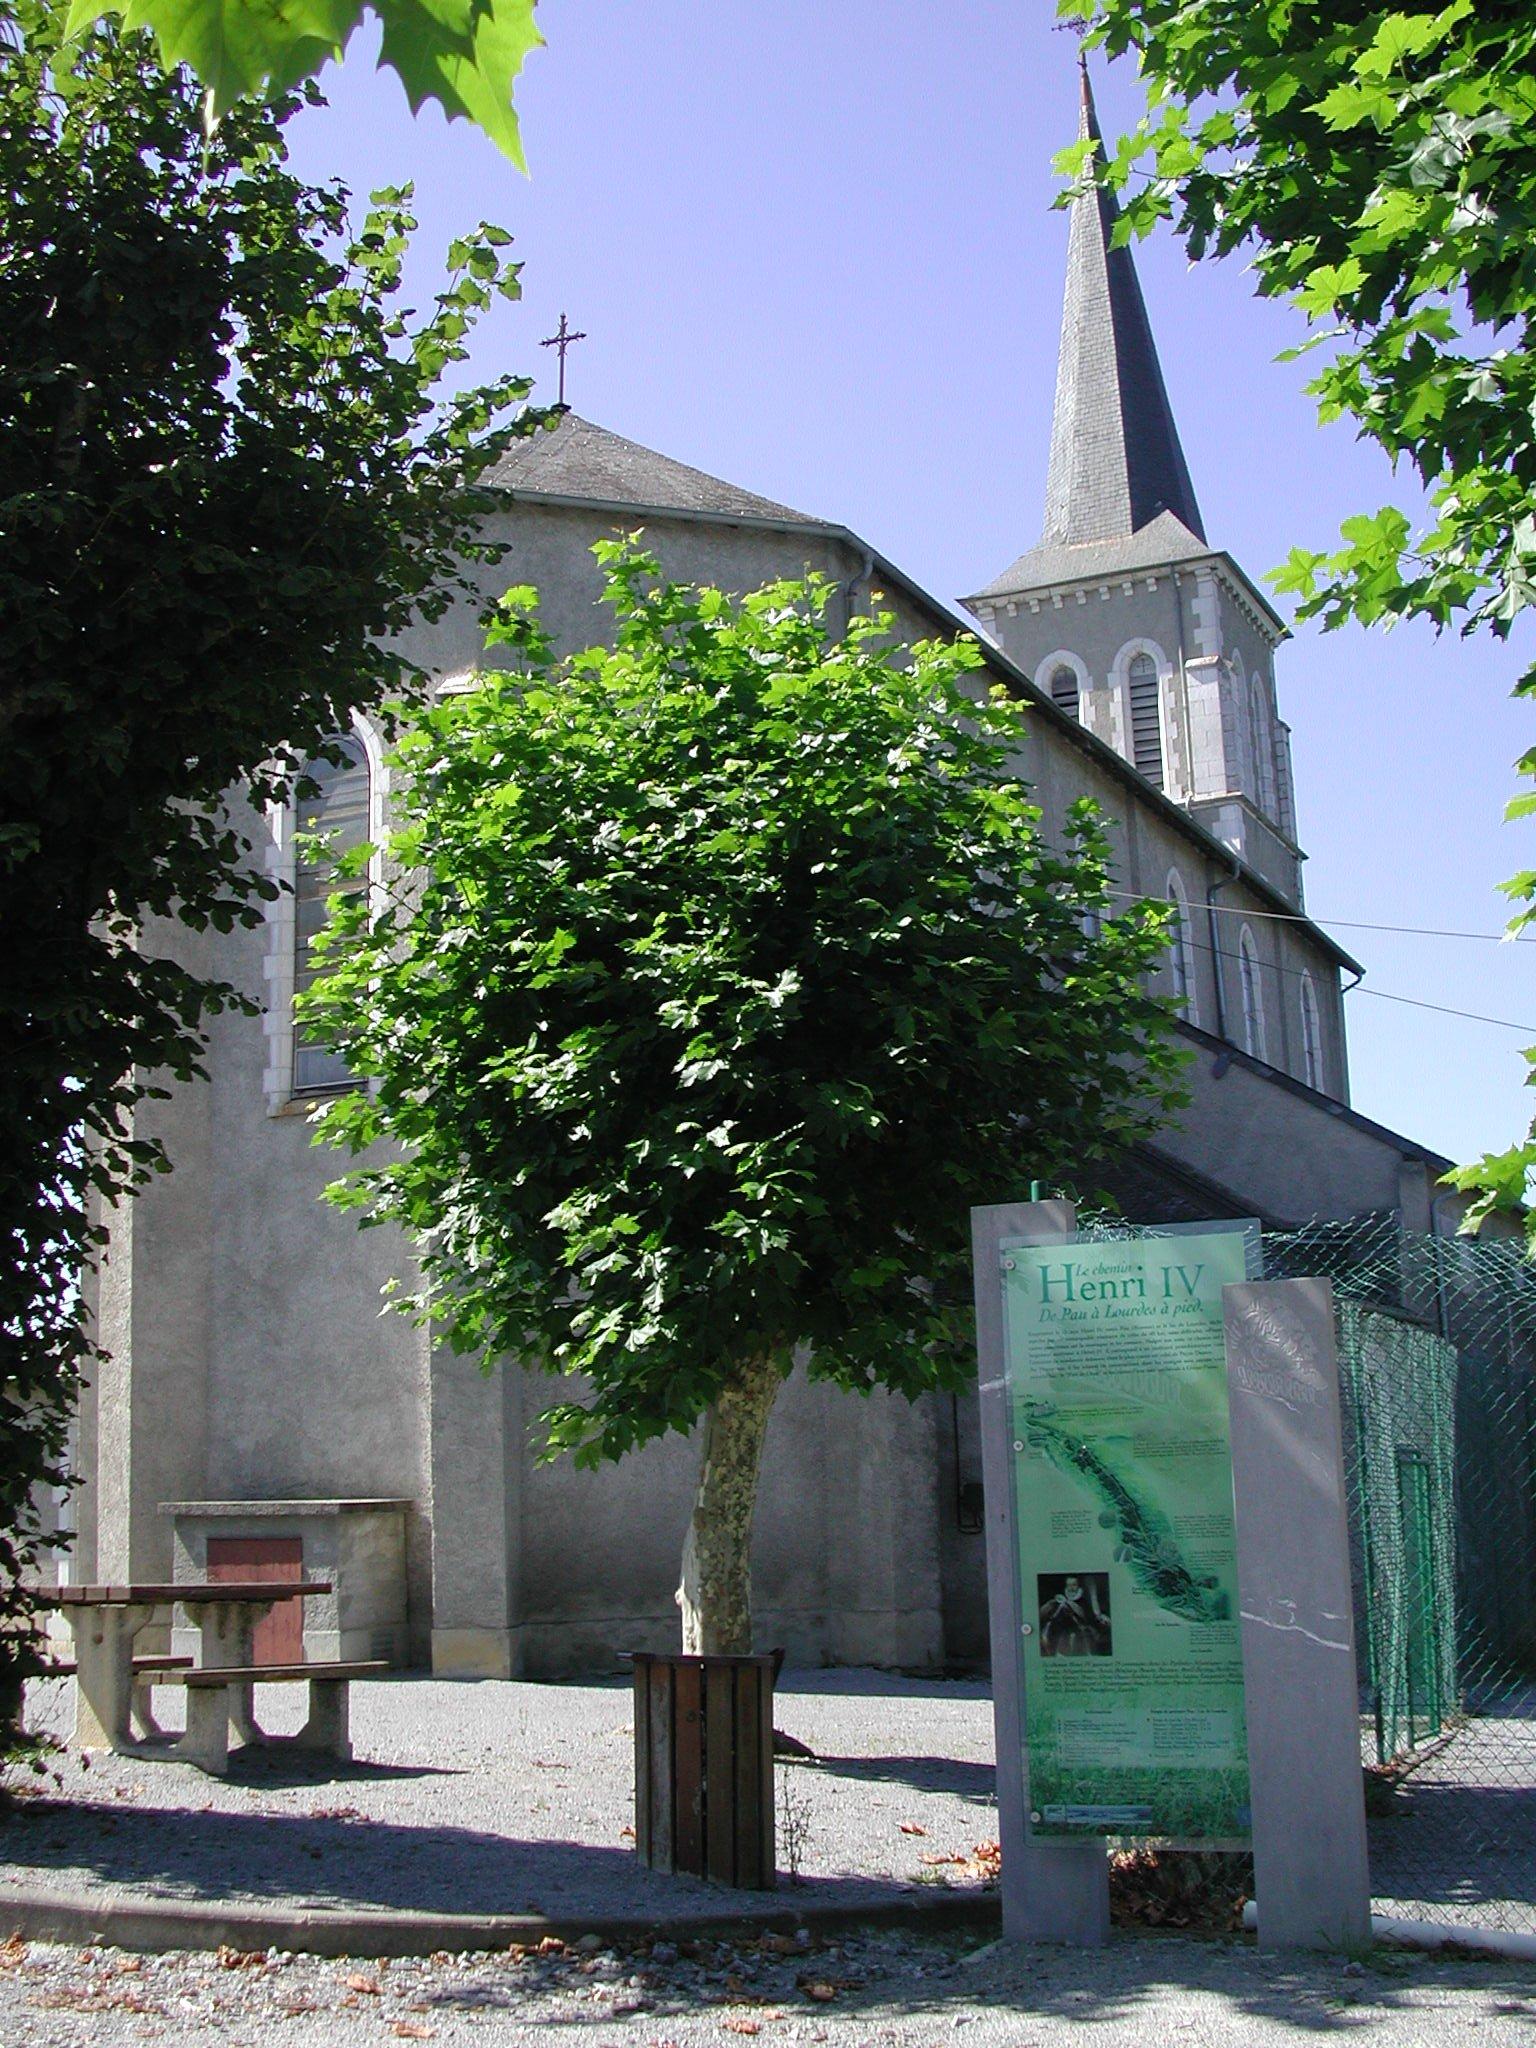 Source: Wikimedia/Michaël64